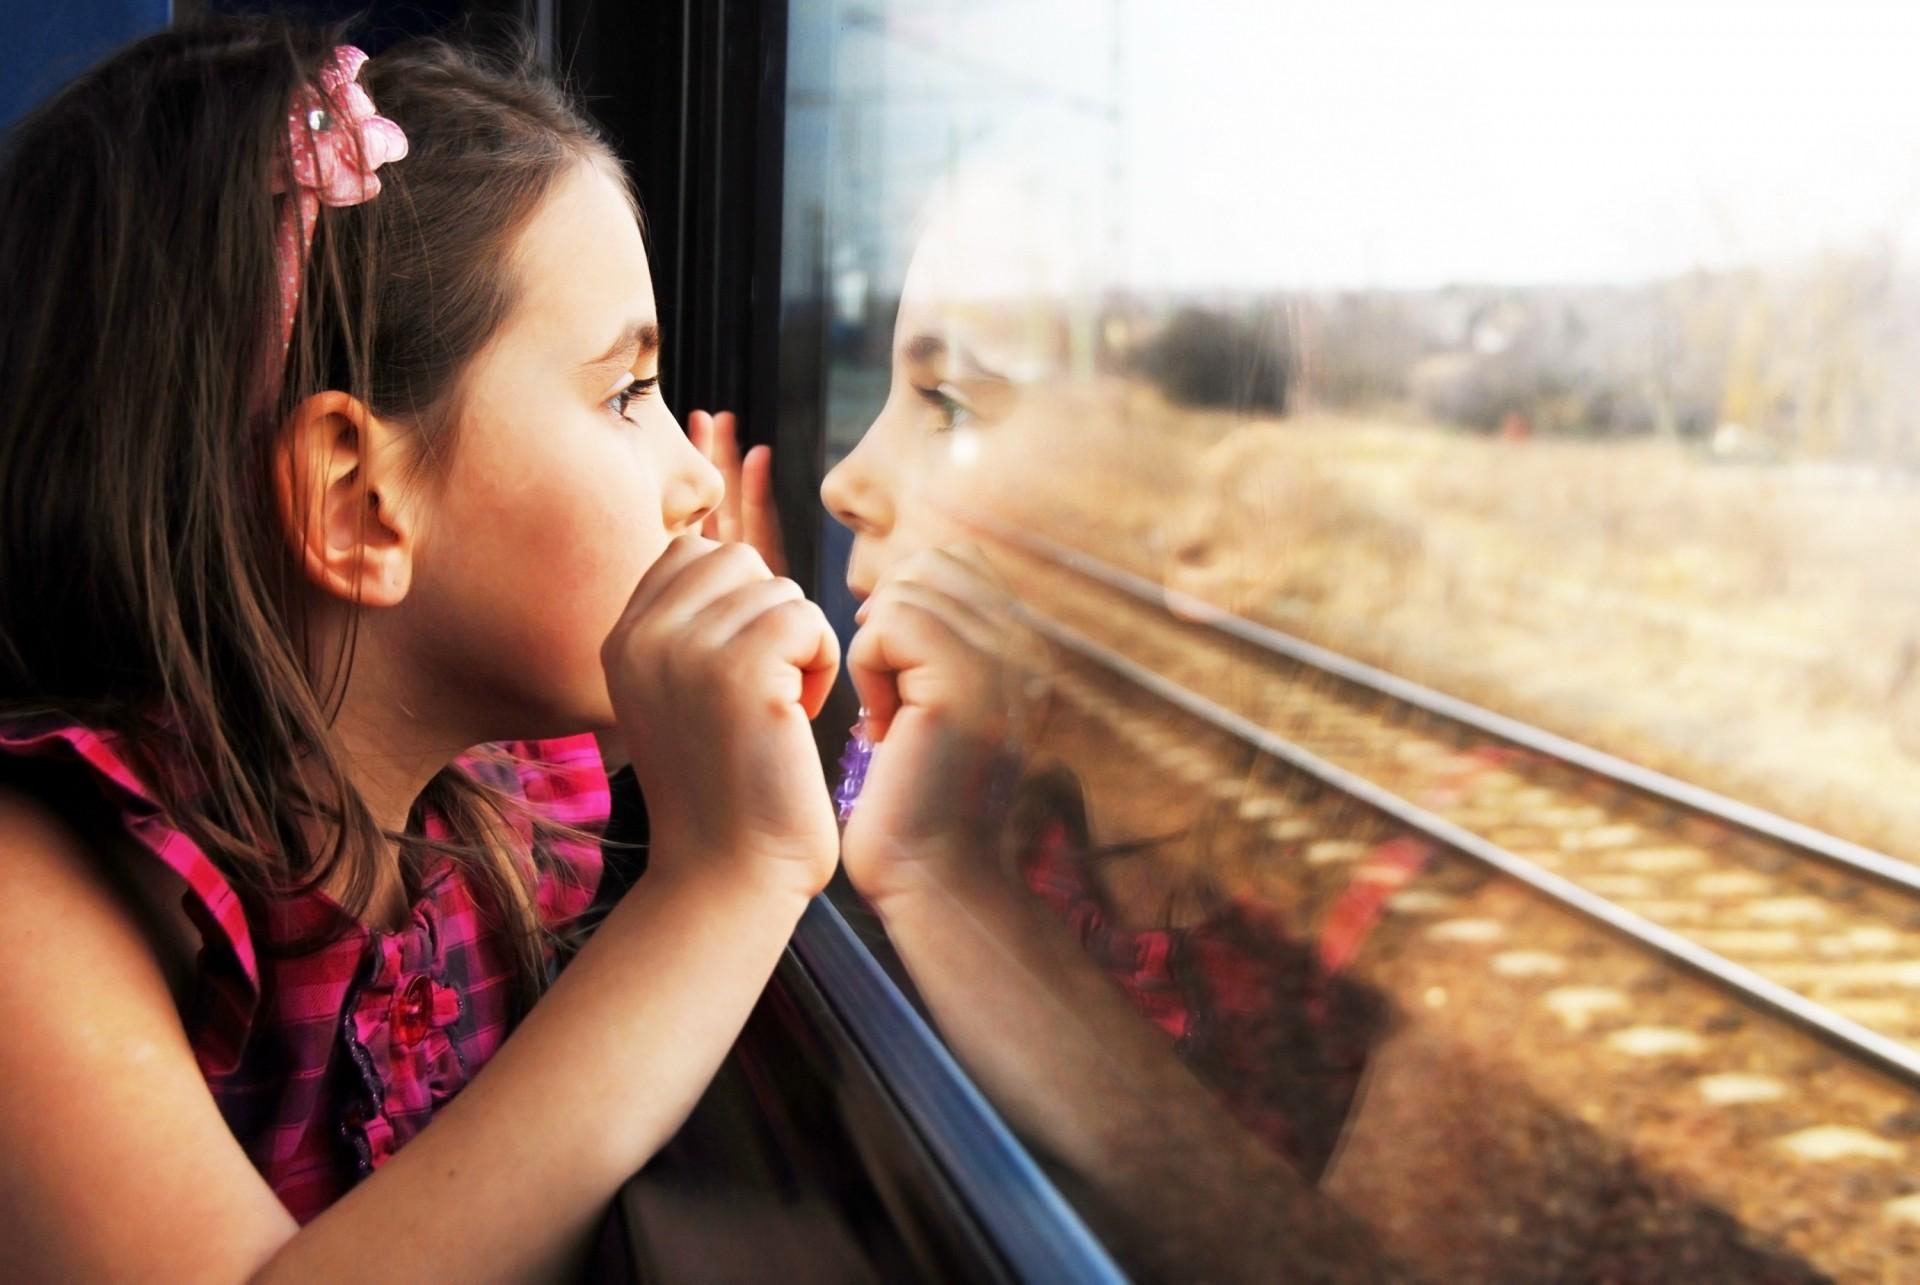 Фото в проездном ребенка